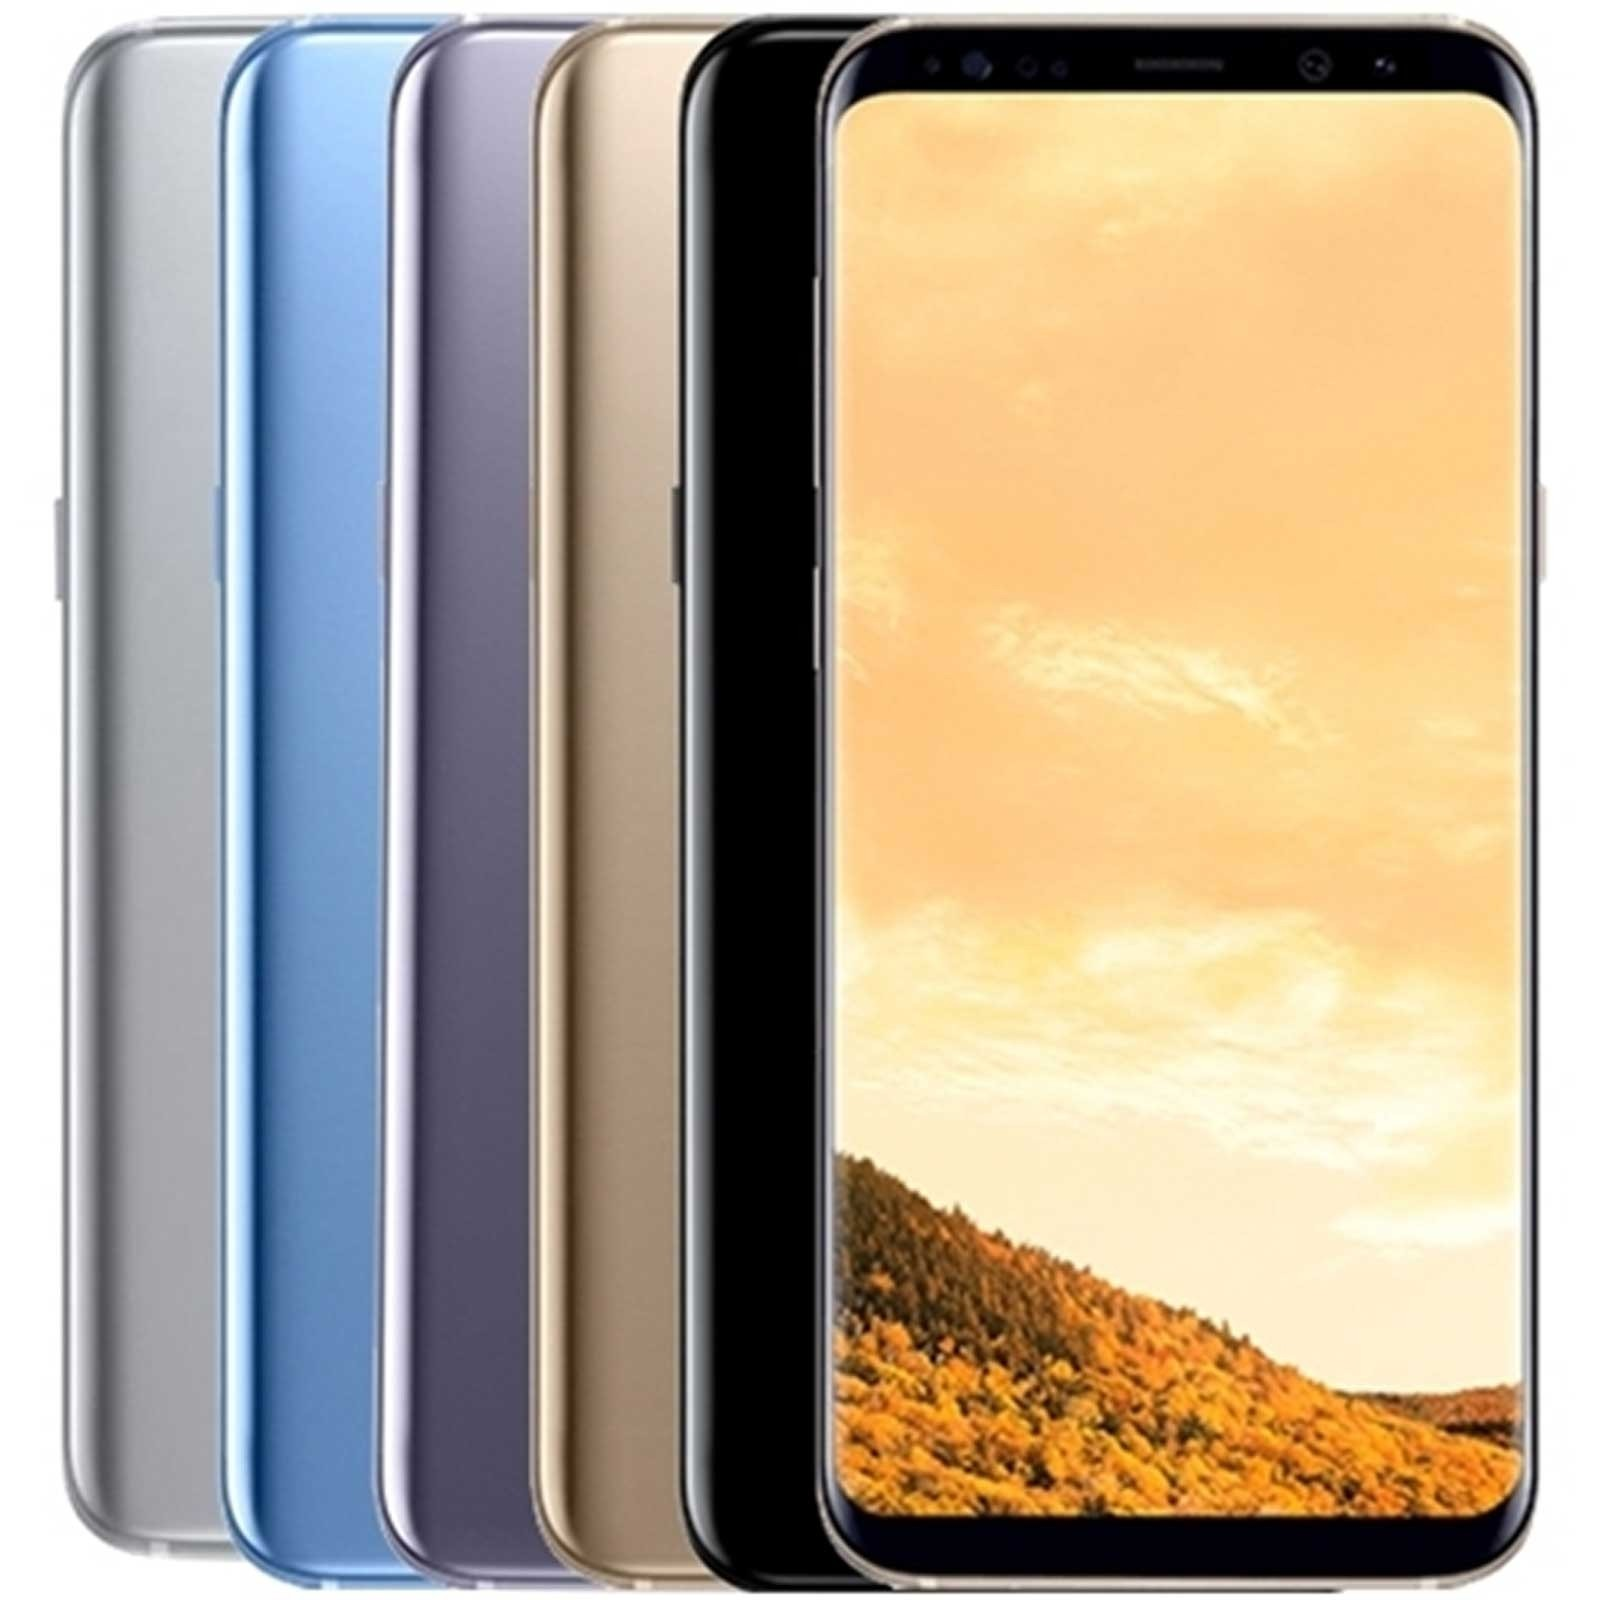 Samsung Galaxy S8 Plus - SM-G955F - European Version - Unlocked - Refurbished Samsung - 1